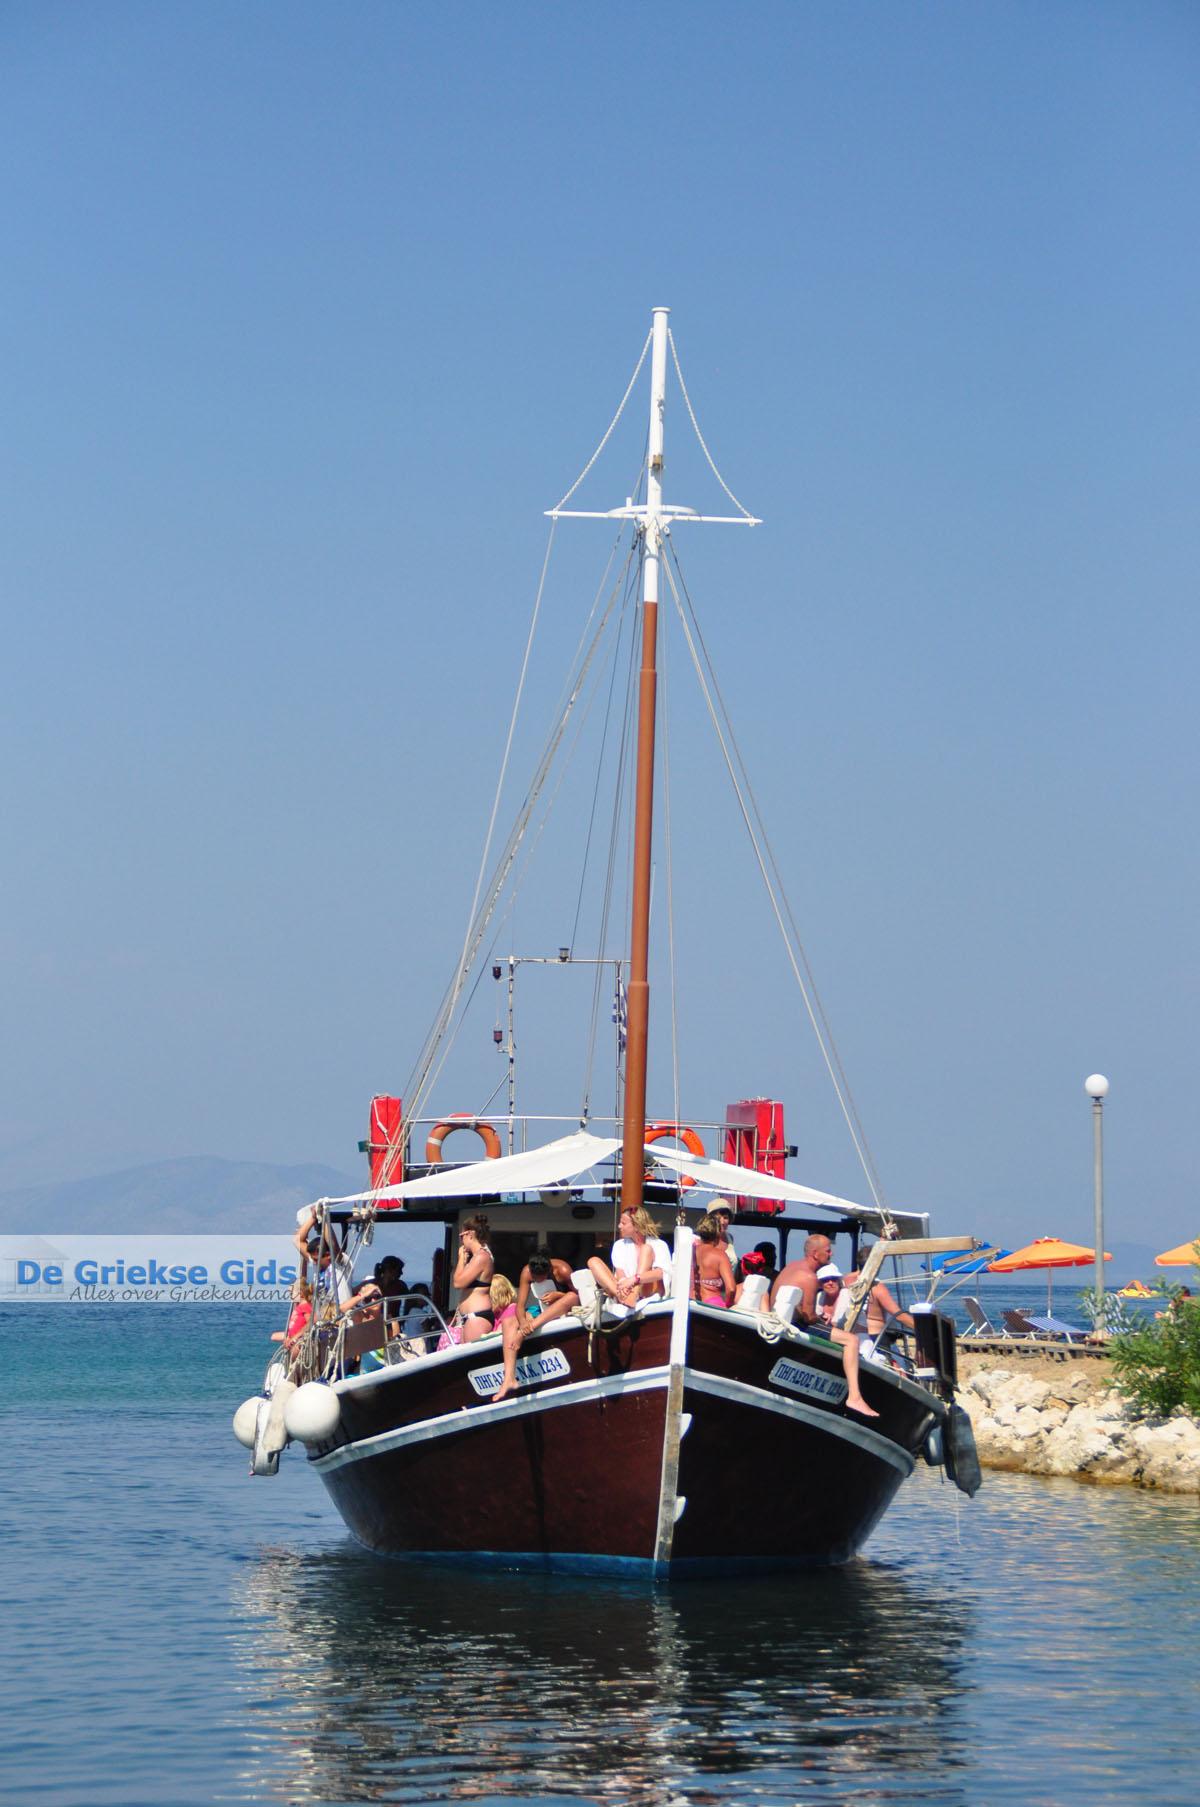 foto Moraitika | Corfu | De Griekse Gids - foto 7